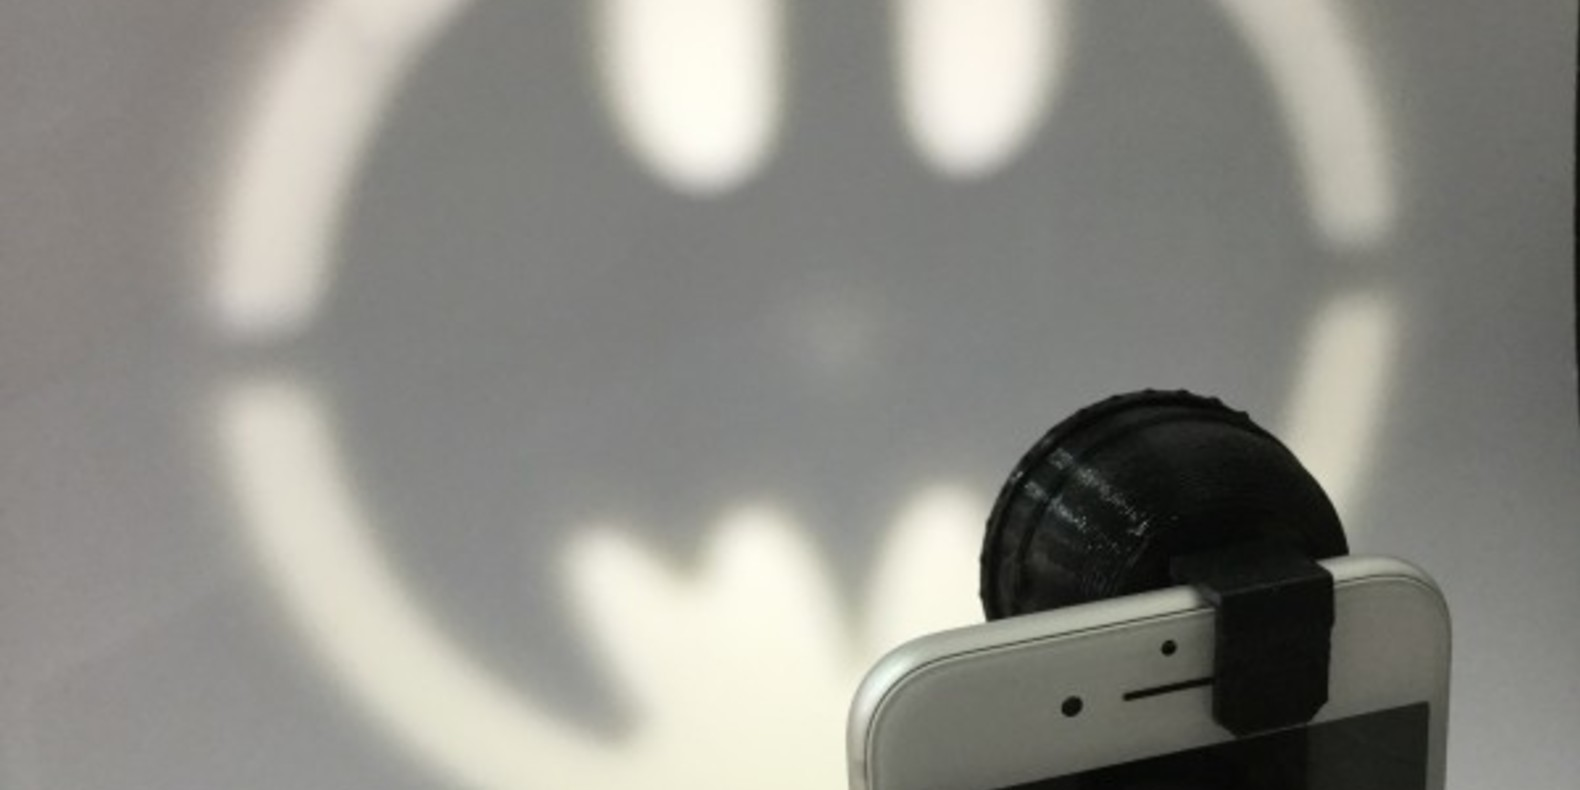 Bat-signal-fichier-3D-stl-cults-3DNG-iphone-4.jpg